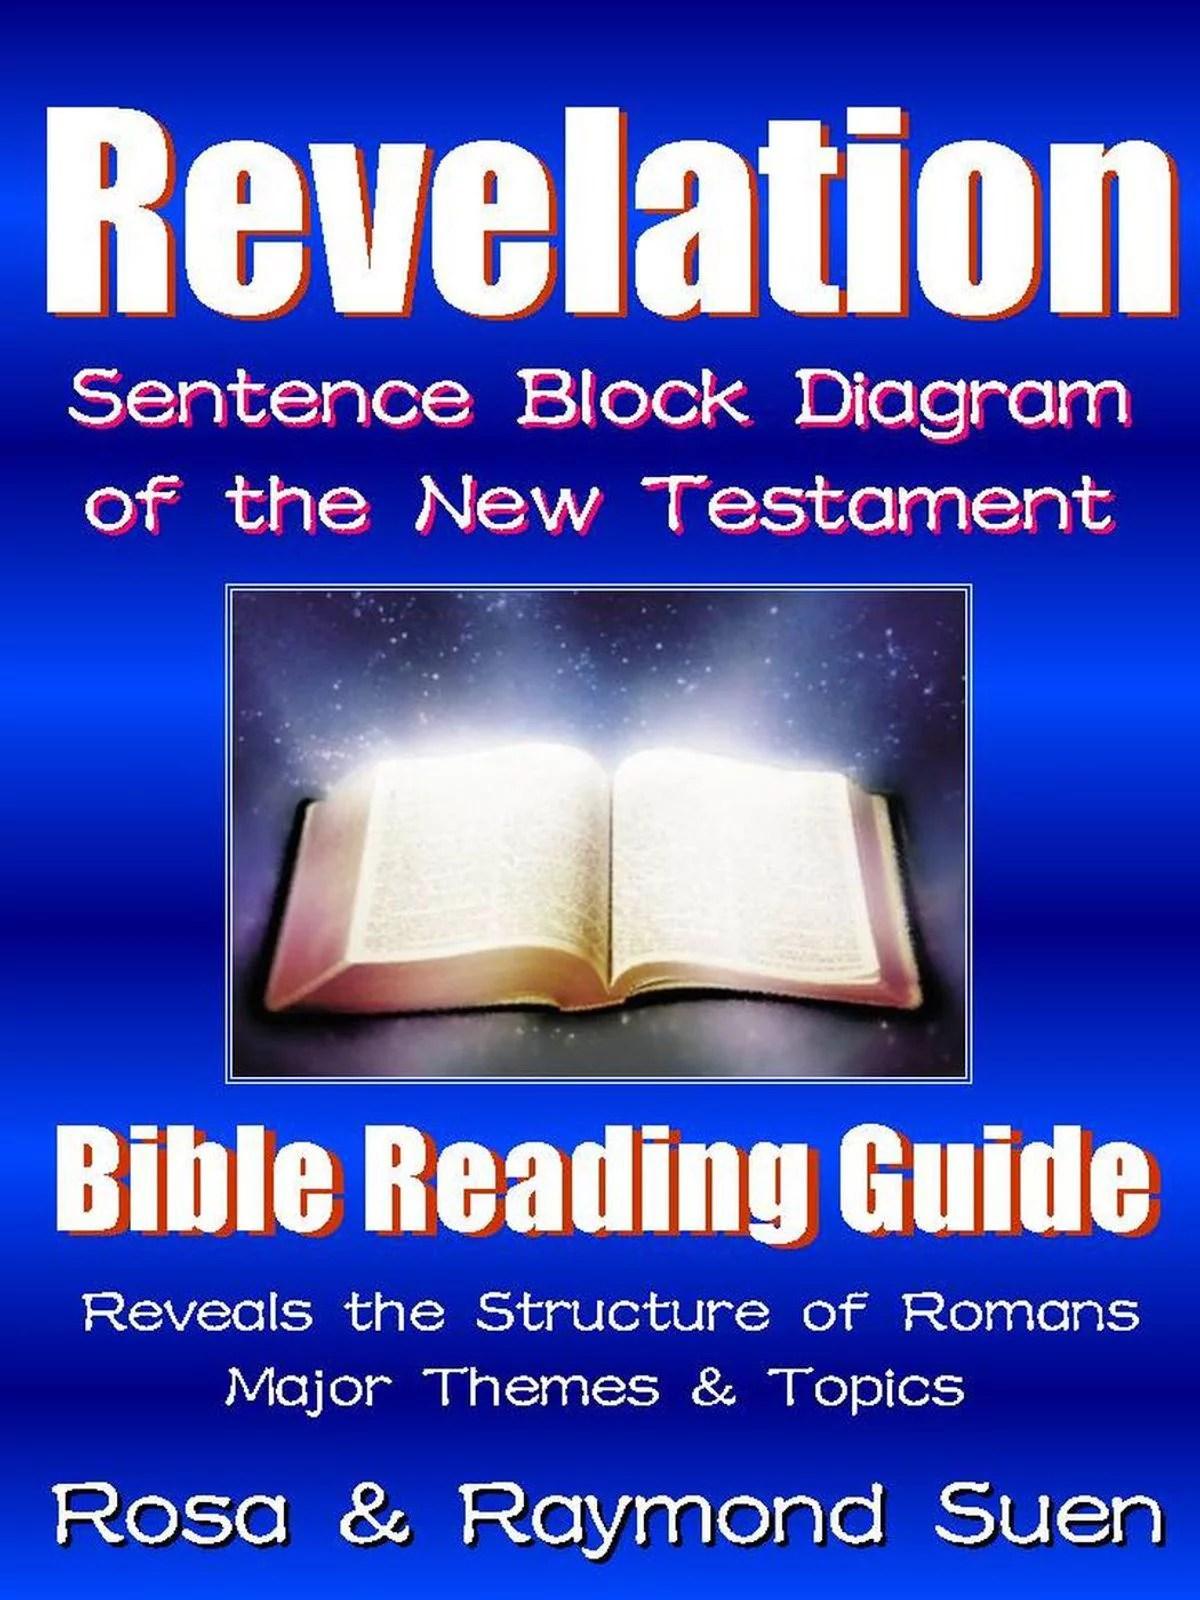 Book of Revelation  Sentence Block Diagram Method of the